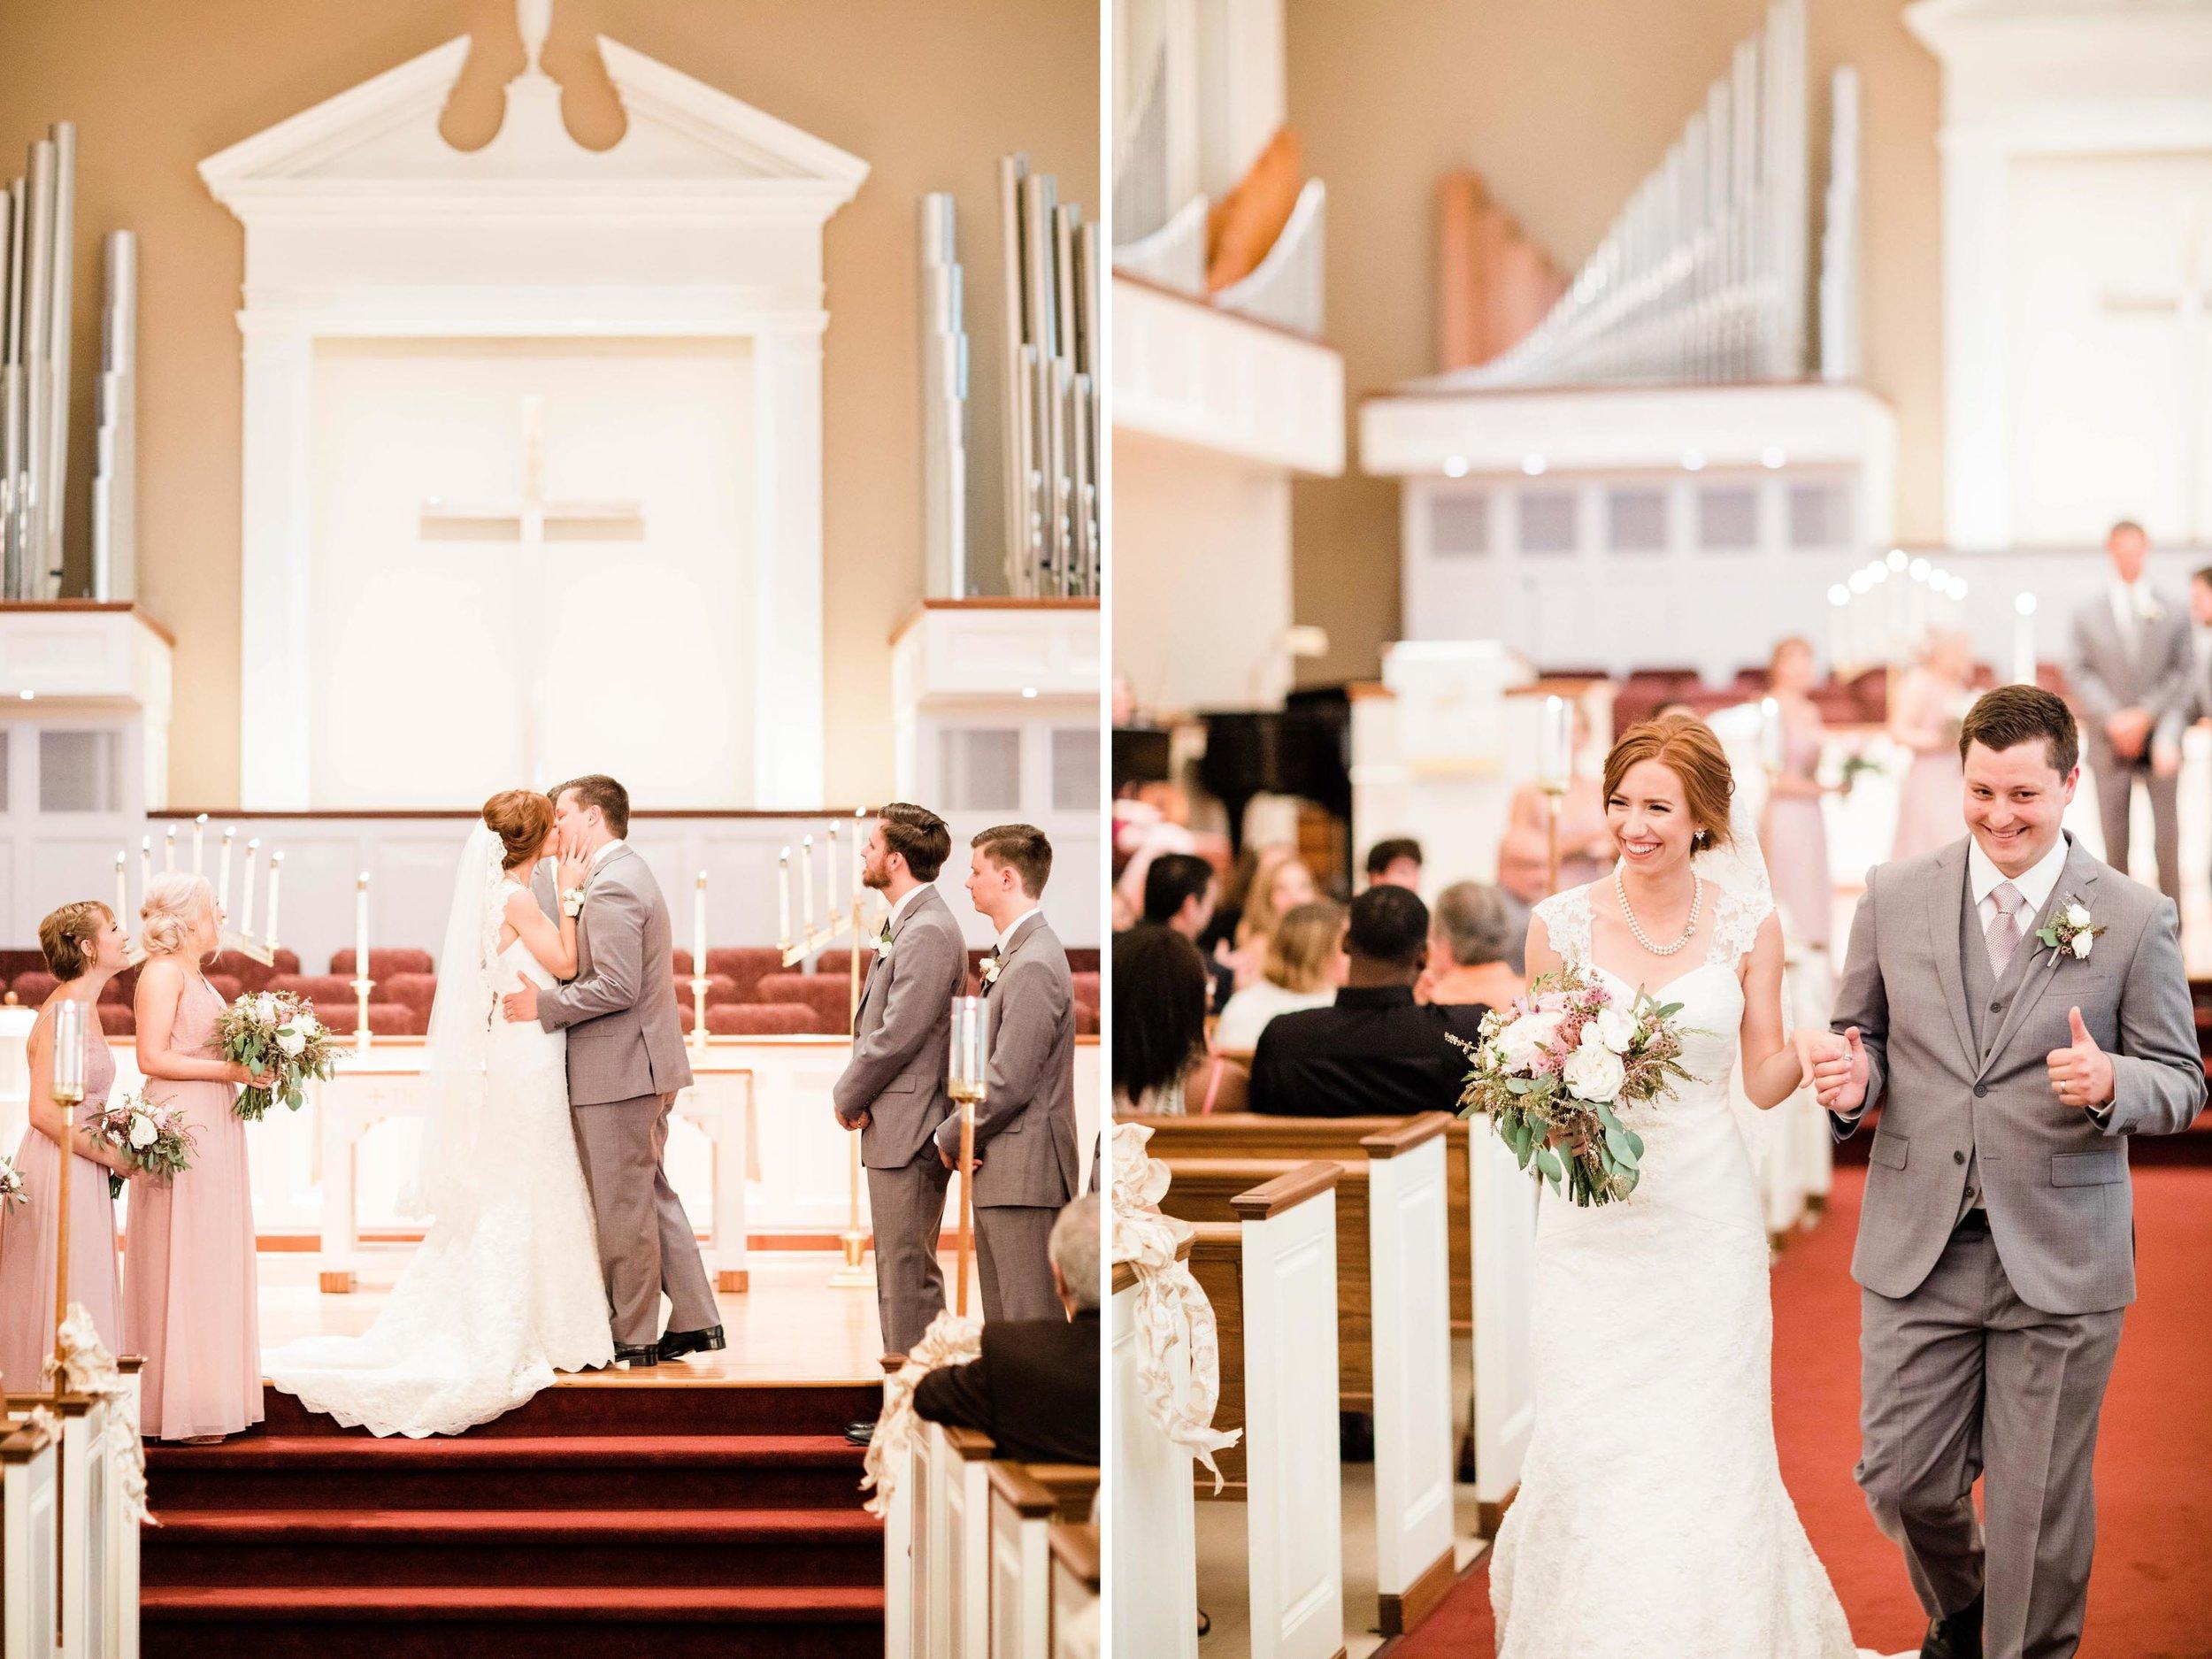 anderson hills united methodist church wedding photographer.jpg